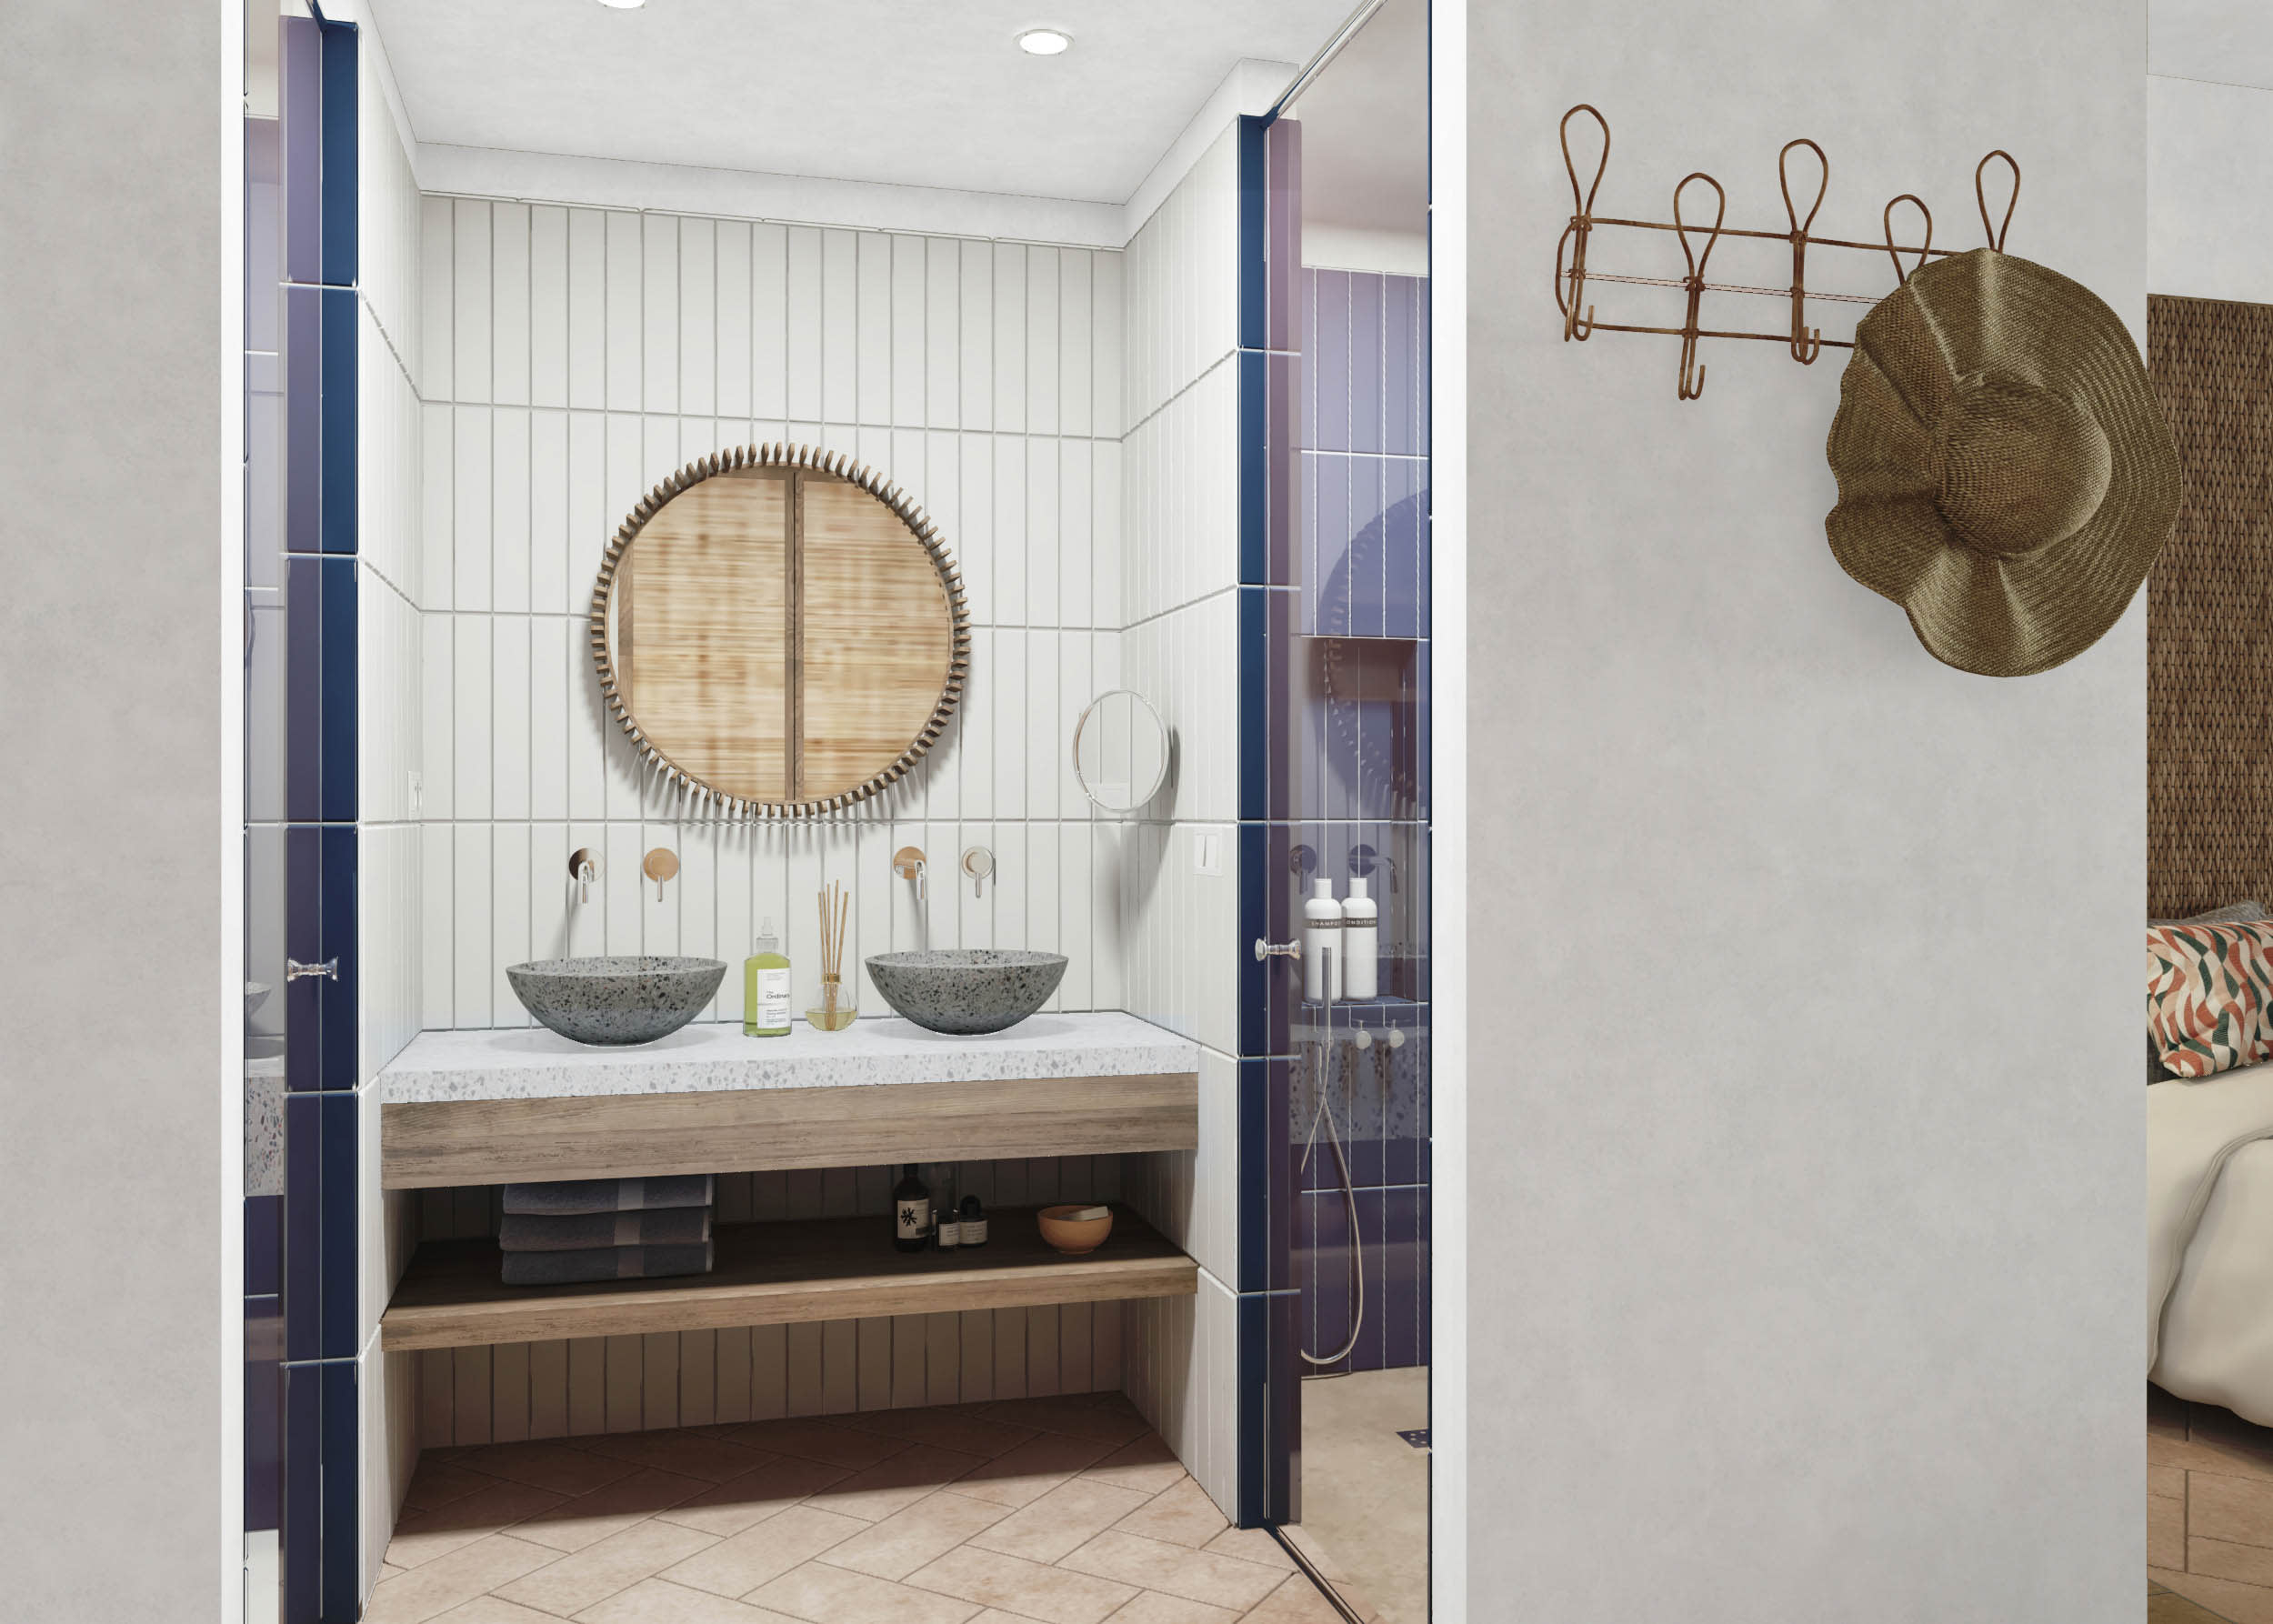 Double Garden View bathroom